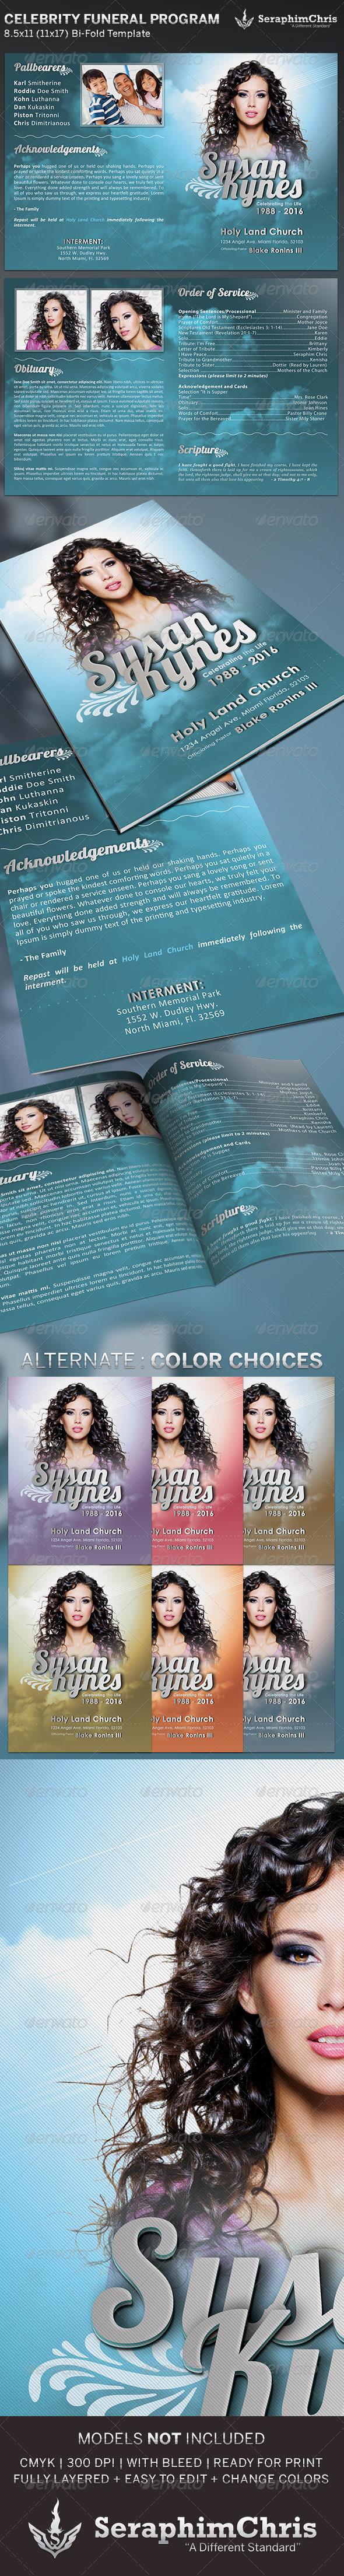 GraphicRiver Celebrity Funeral Program Bi-Fold Template 5077959